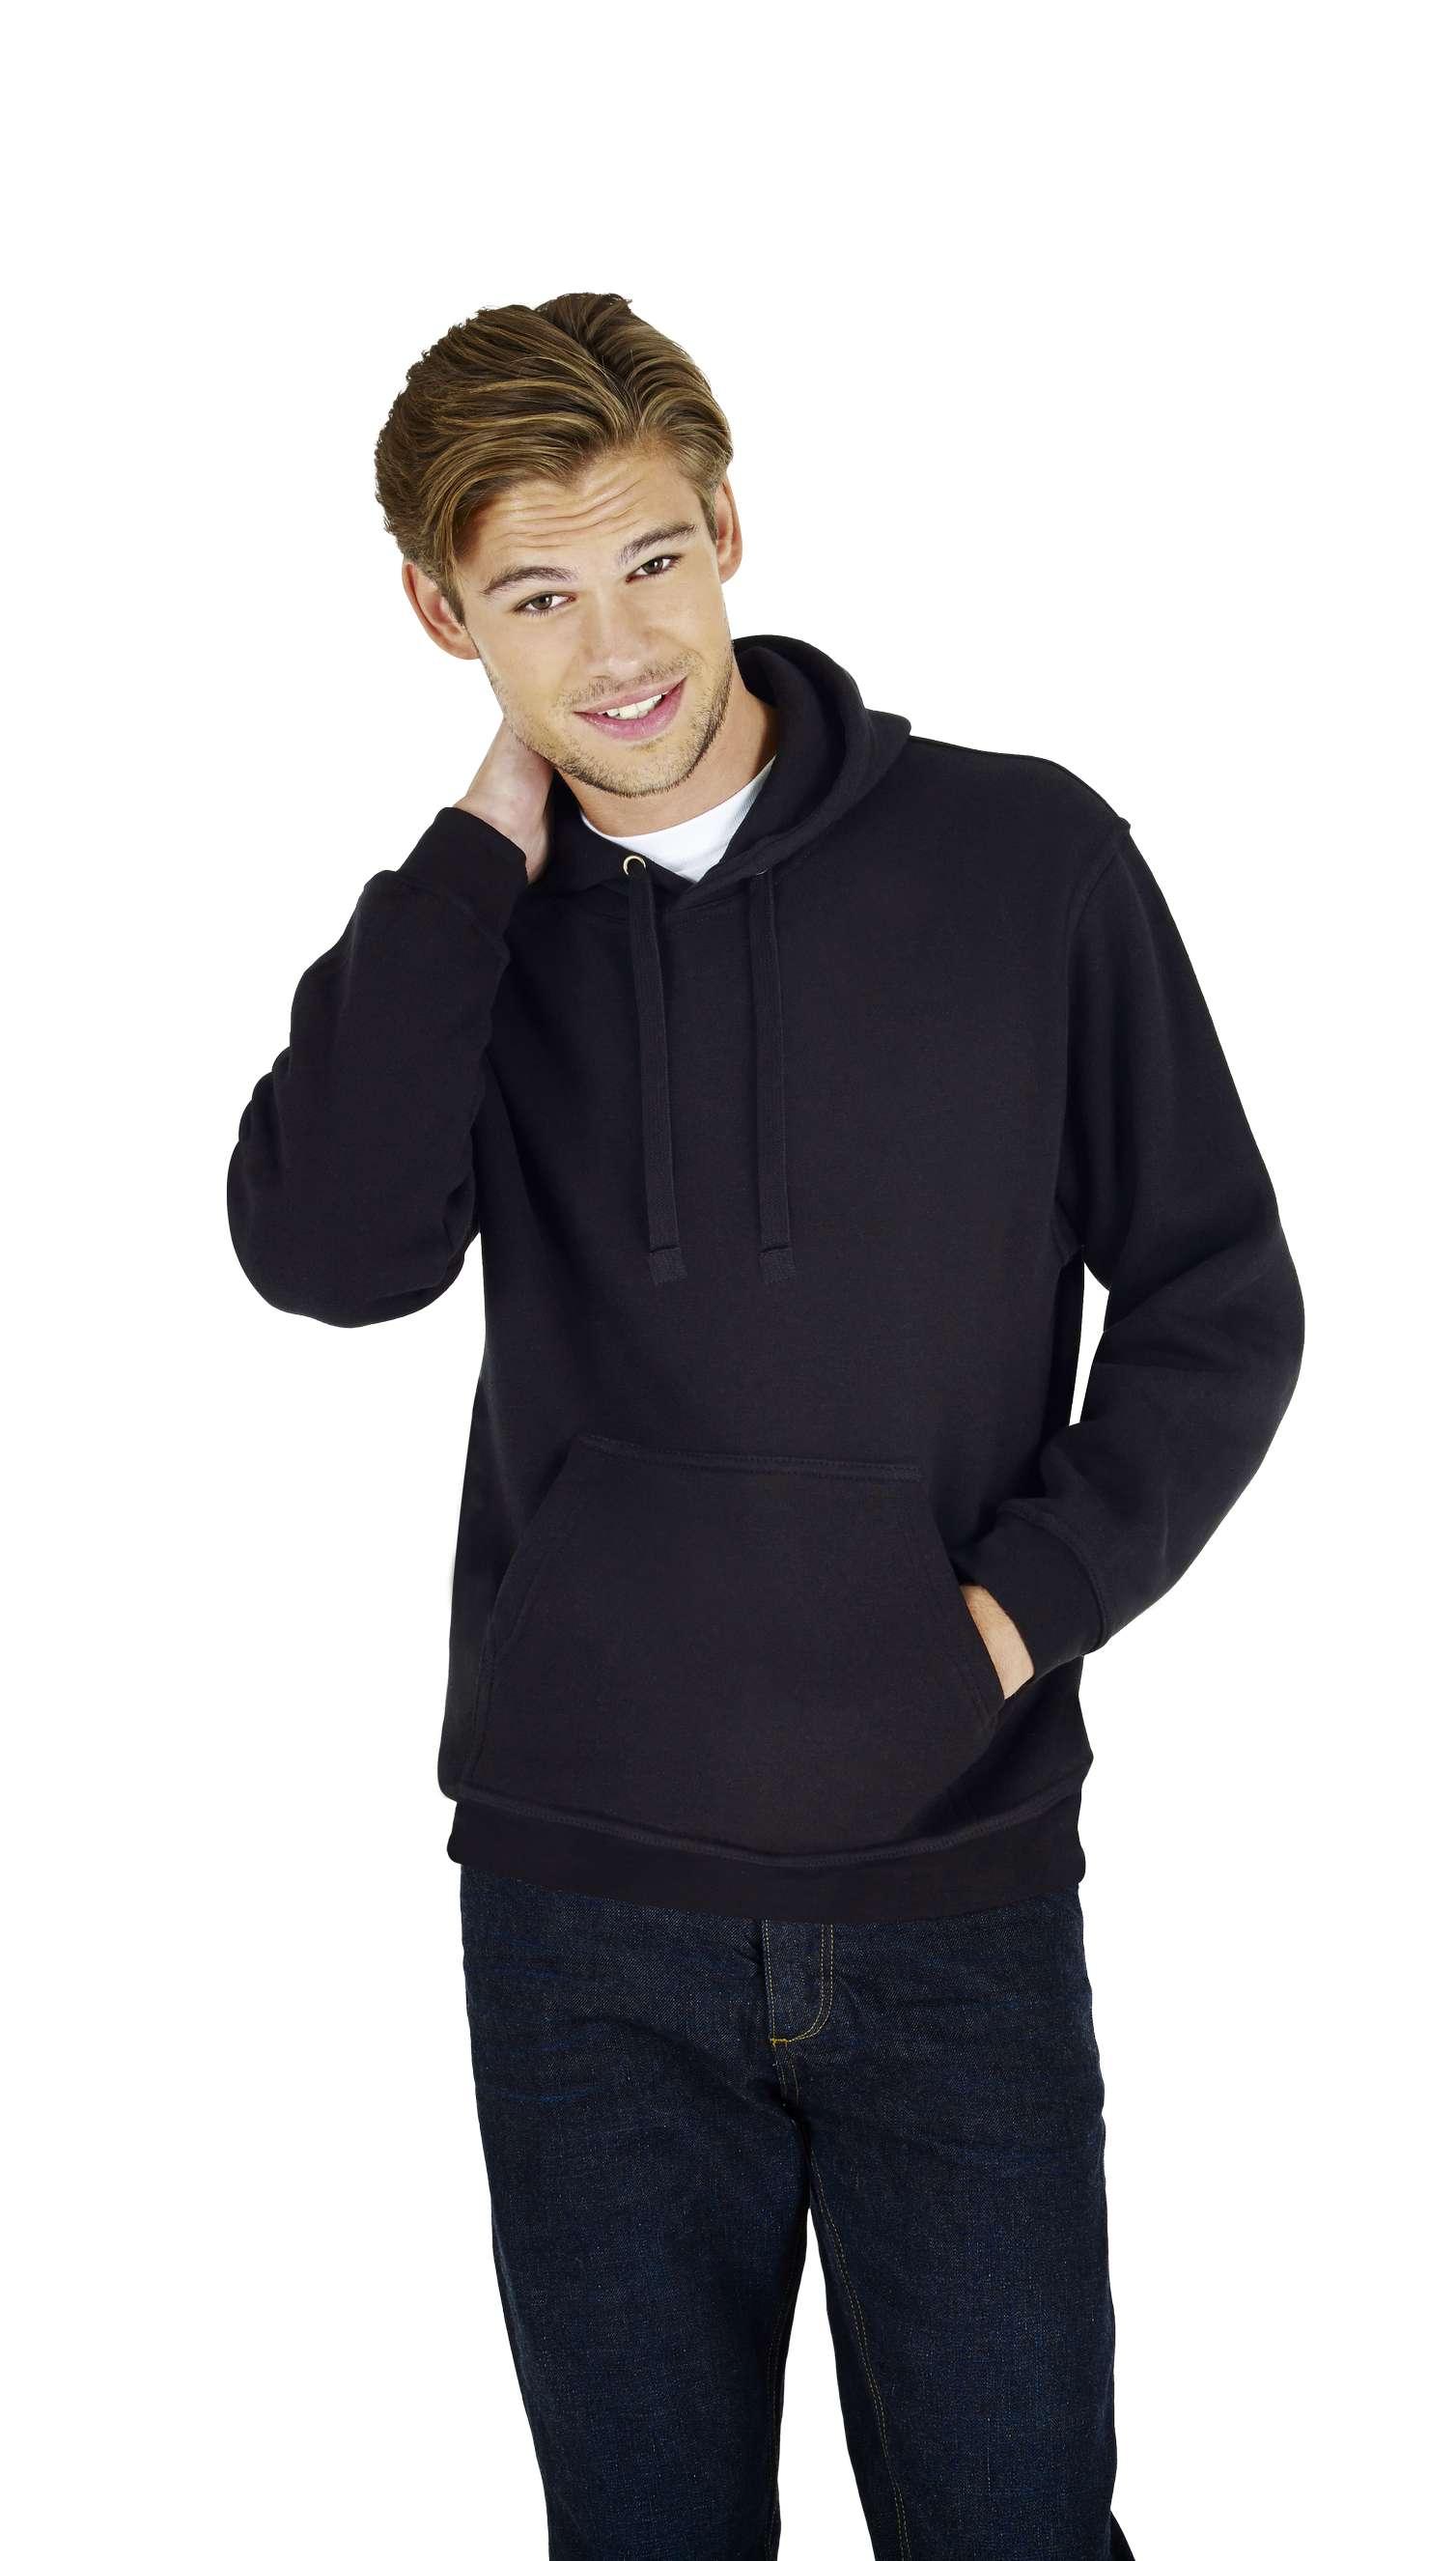 Sweat shirt personnalisable Value Hood - sweat shirt promotionnel